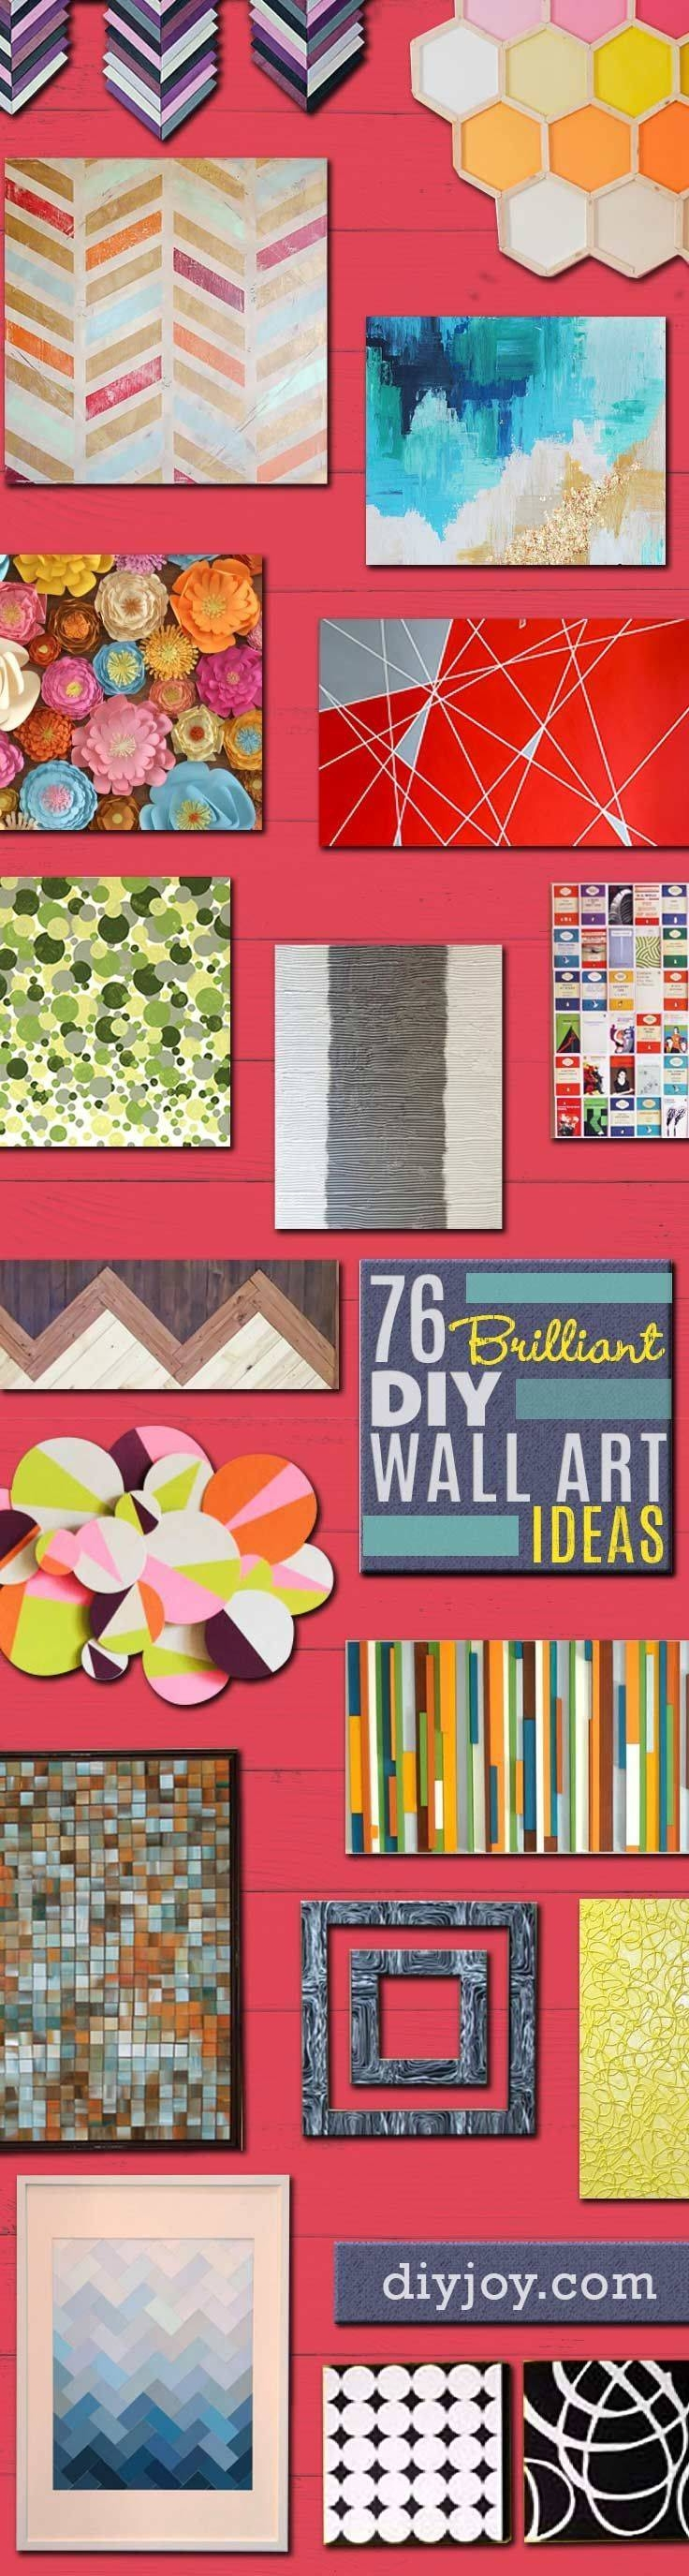 Best 25+ Wall Art Decor Ideas On Pinterest | Art Decor, Home Wall Inside Most Recently Released Pinterest Wall Art Decor (View 19 of 25)